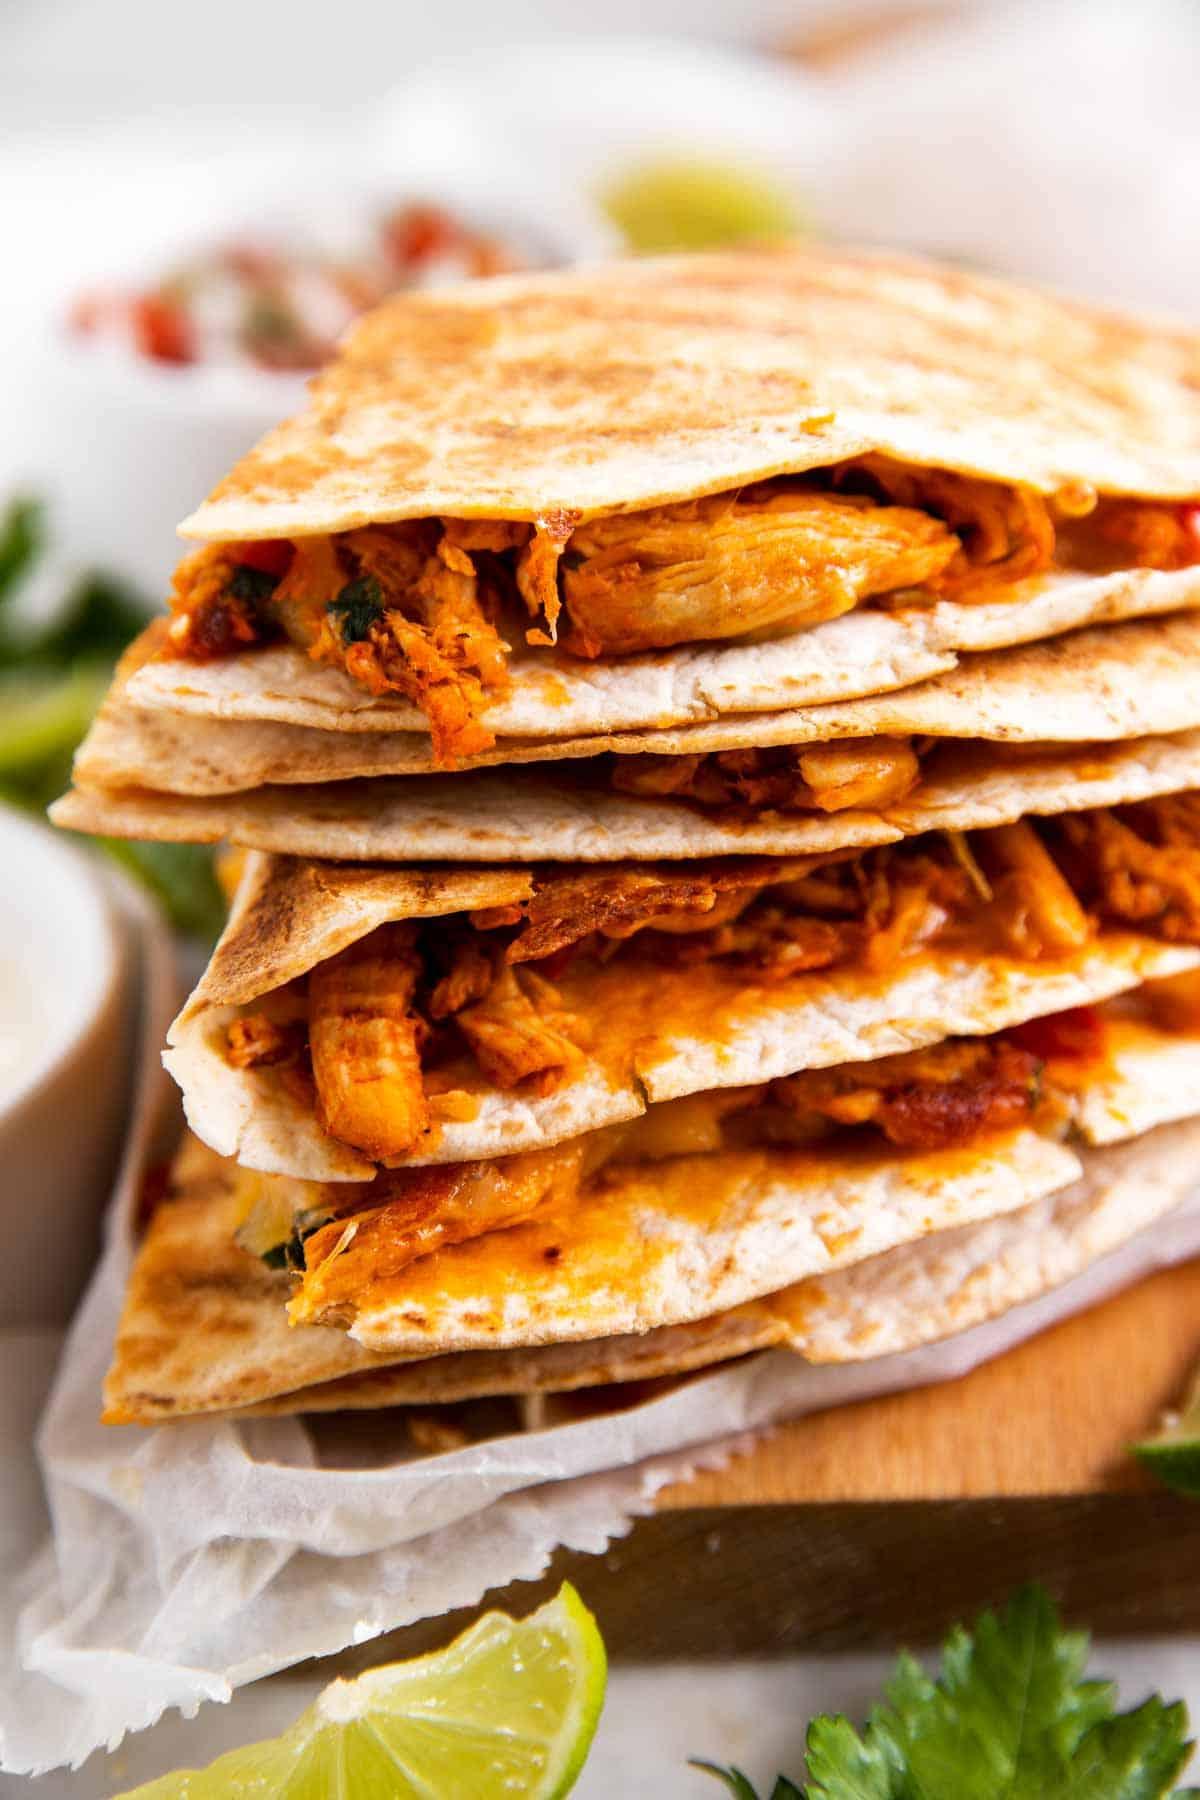 stack of chicken quesadillas on wooden board